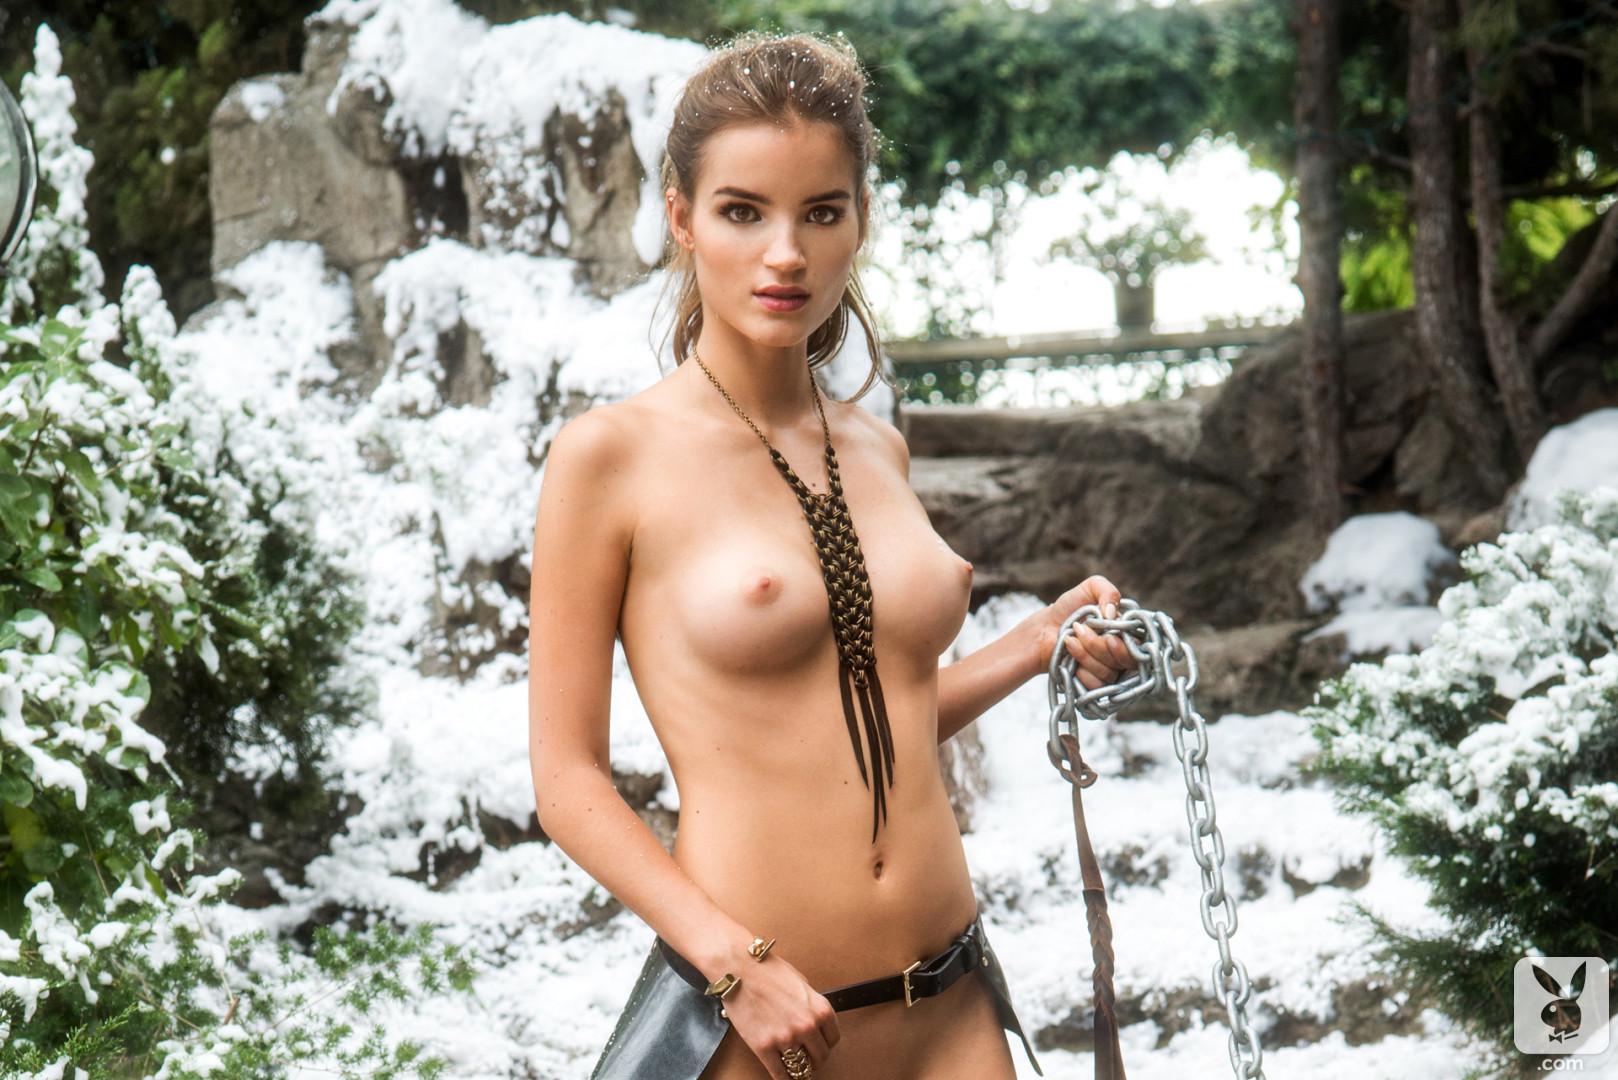 Pussy Roos van Montfort nude (31 photos), Sexy, Leaked, Twitter, cameltoe 2006